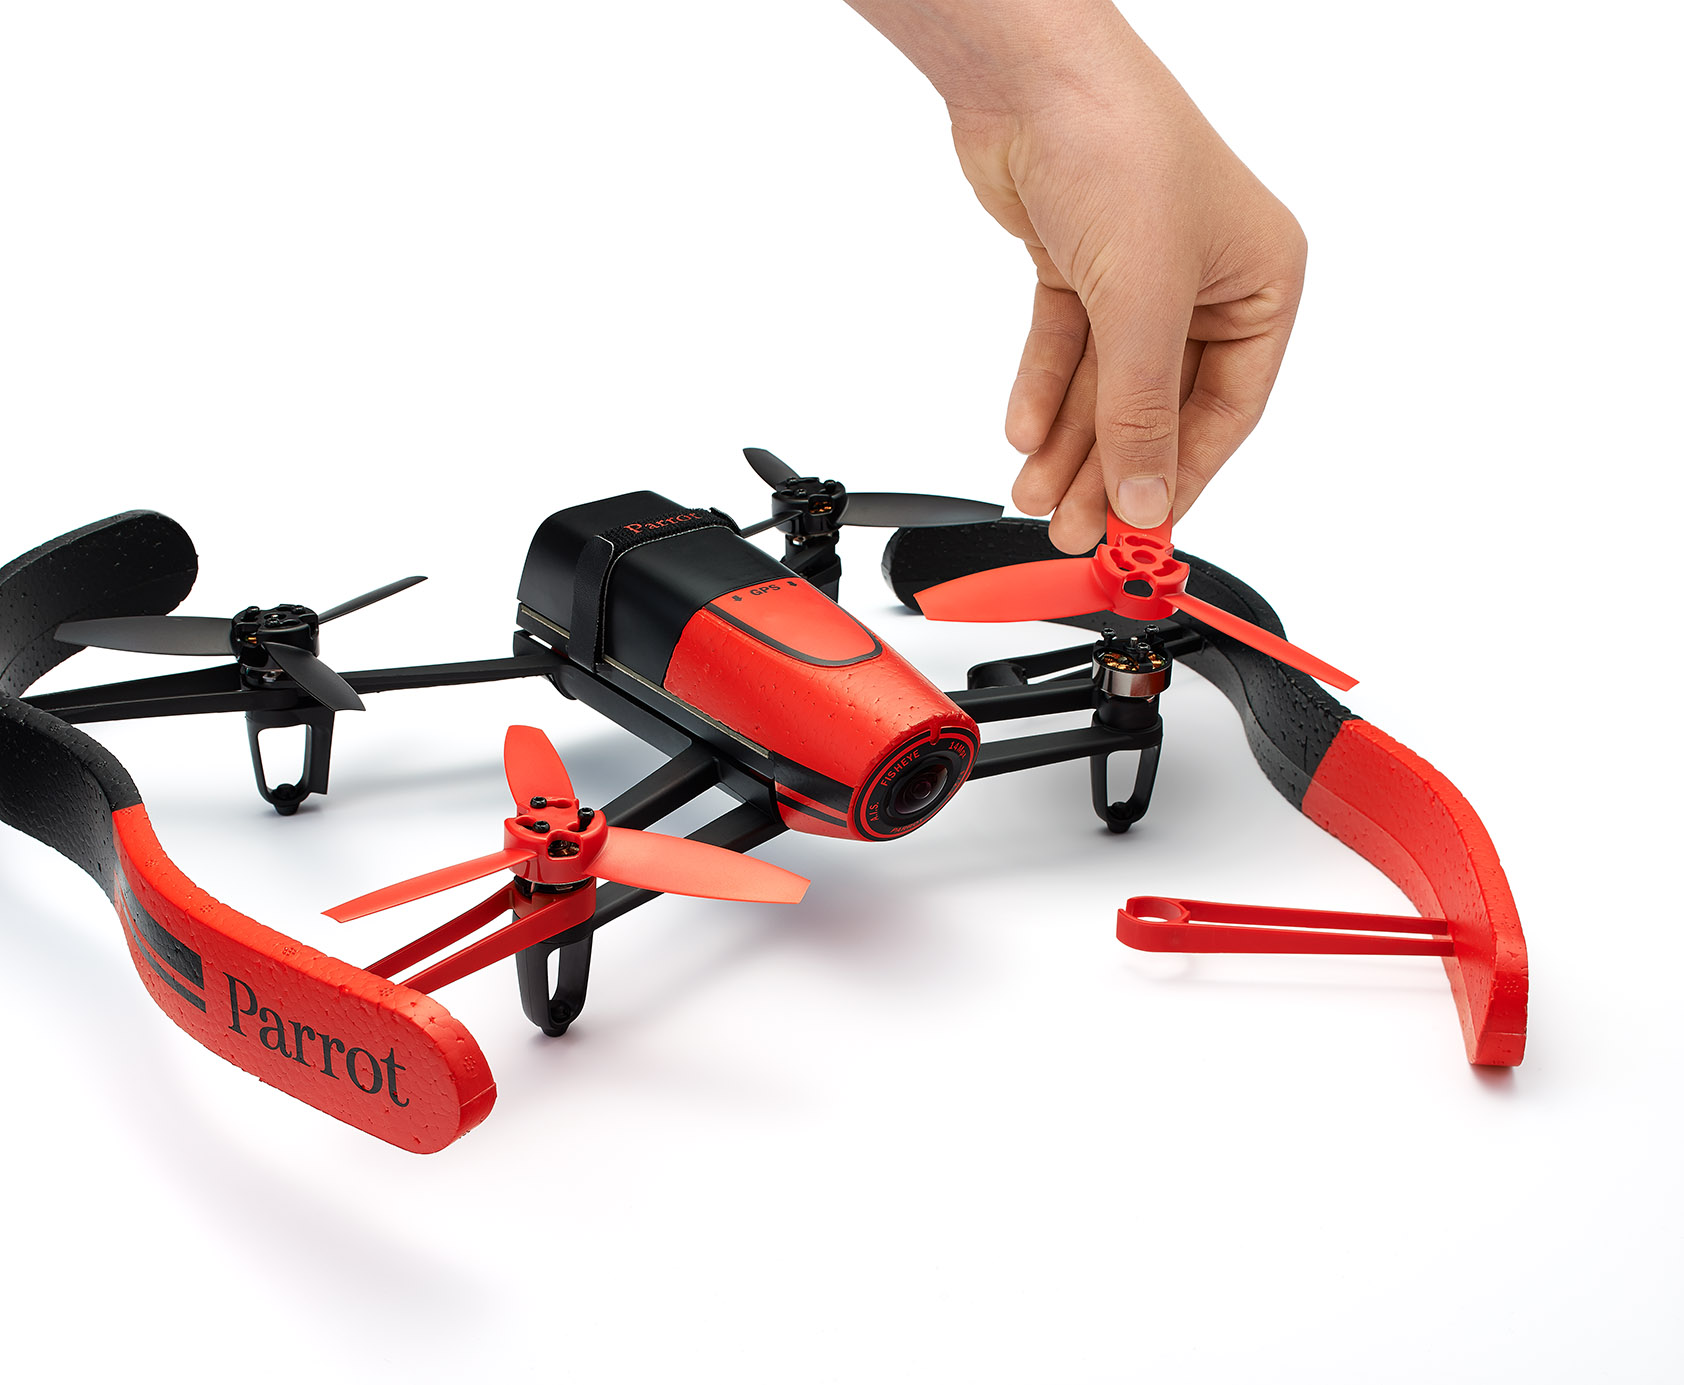 parrot-bebop-drone-new-07.jpg